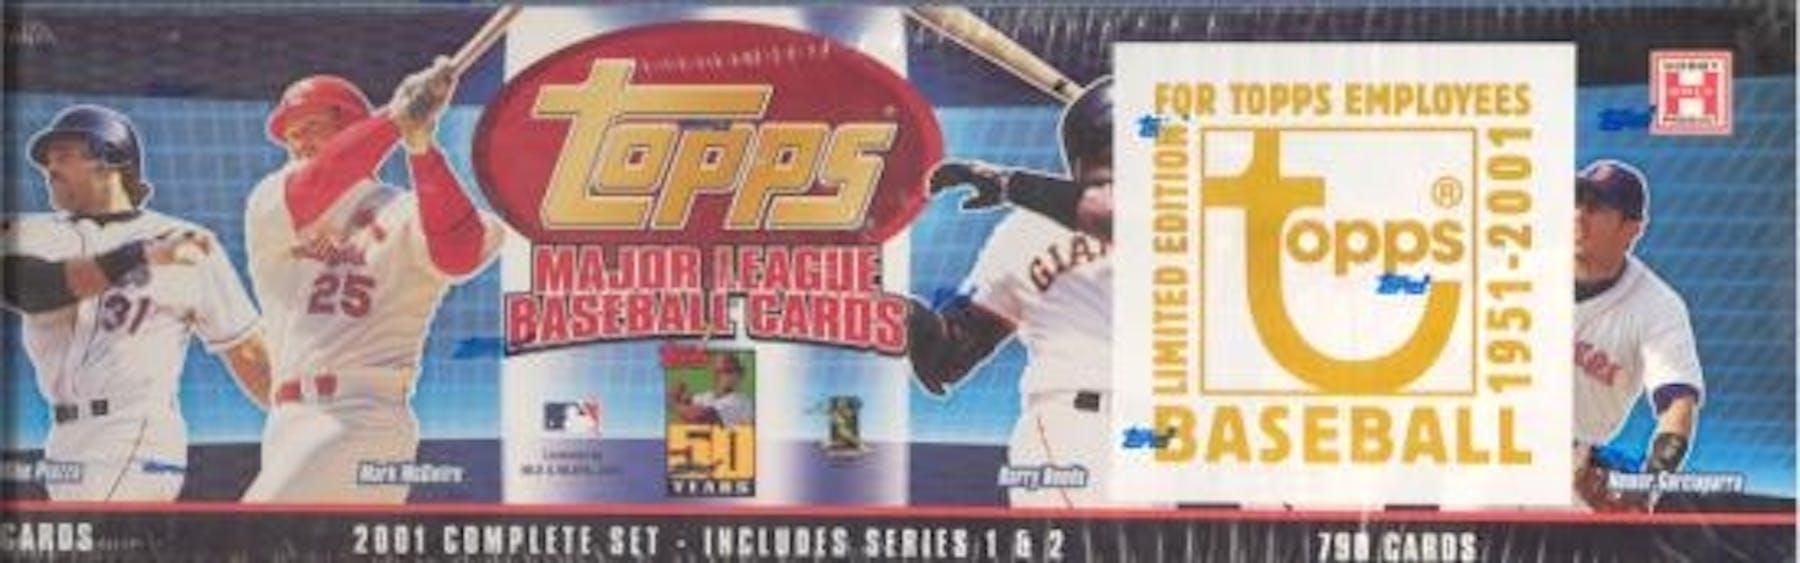 2001 Topps Baseball Factory Set Box Employee Edition